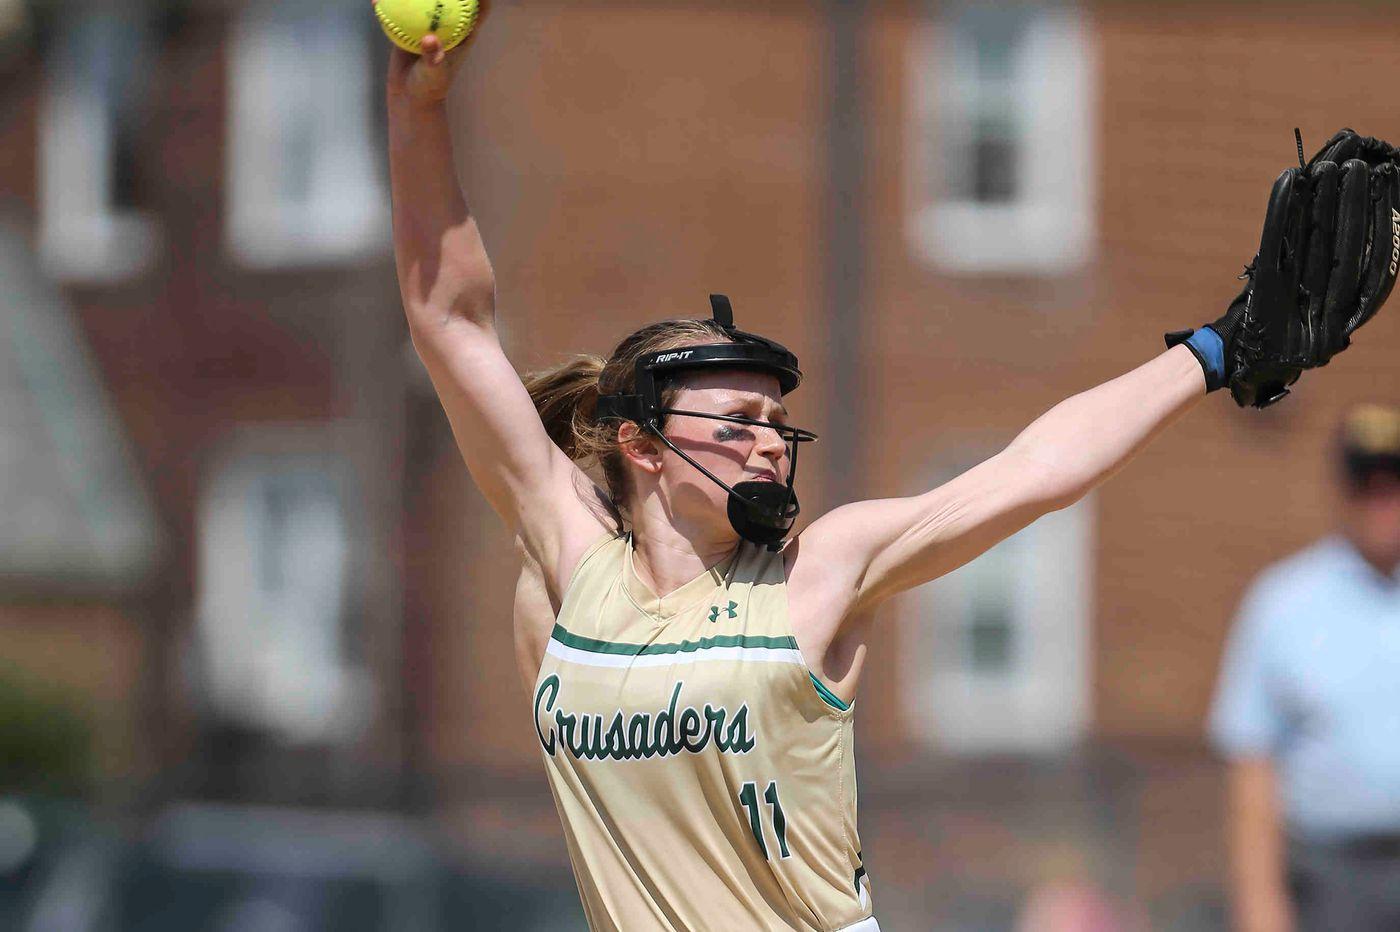 Friday's Southeastern Pa. roundup: Lansdale Catholic softball advances to Catholic League semis on Megan Burns' walk-off home run